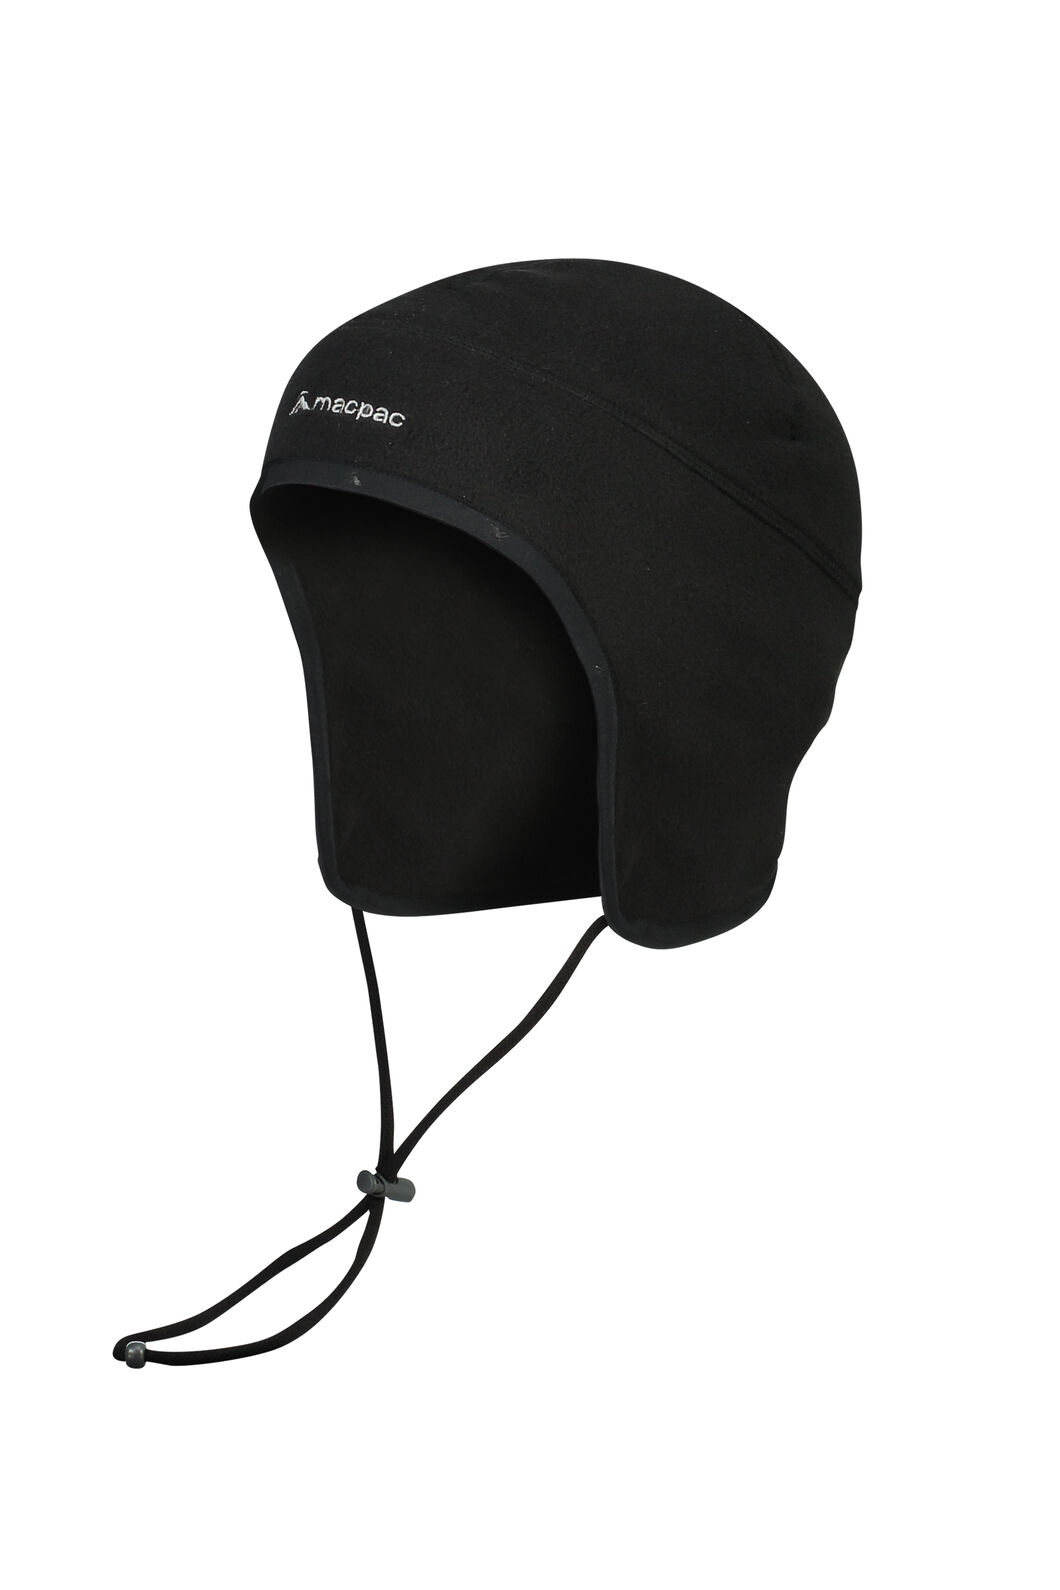 Macpac Earhed Polartec® Micro Fleece® Beanie, Black, hi-res